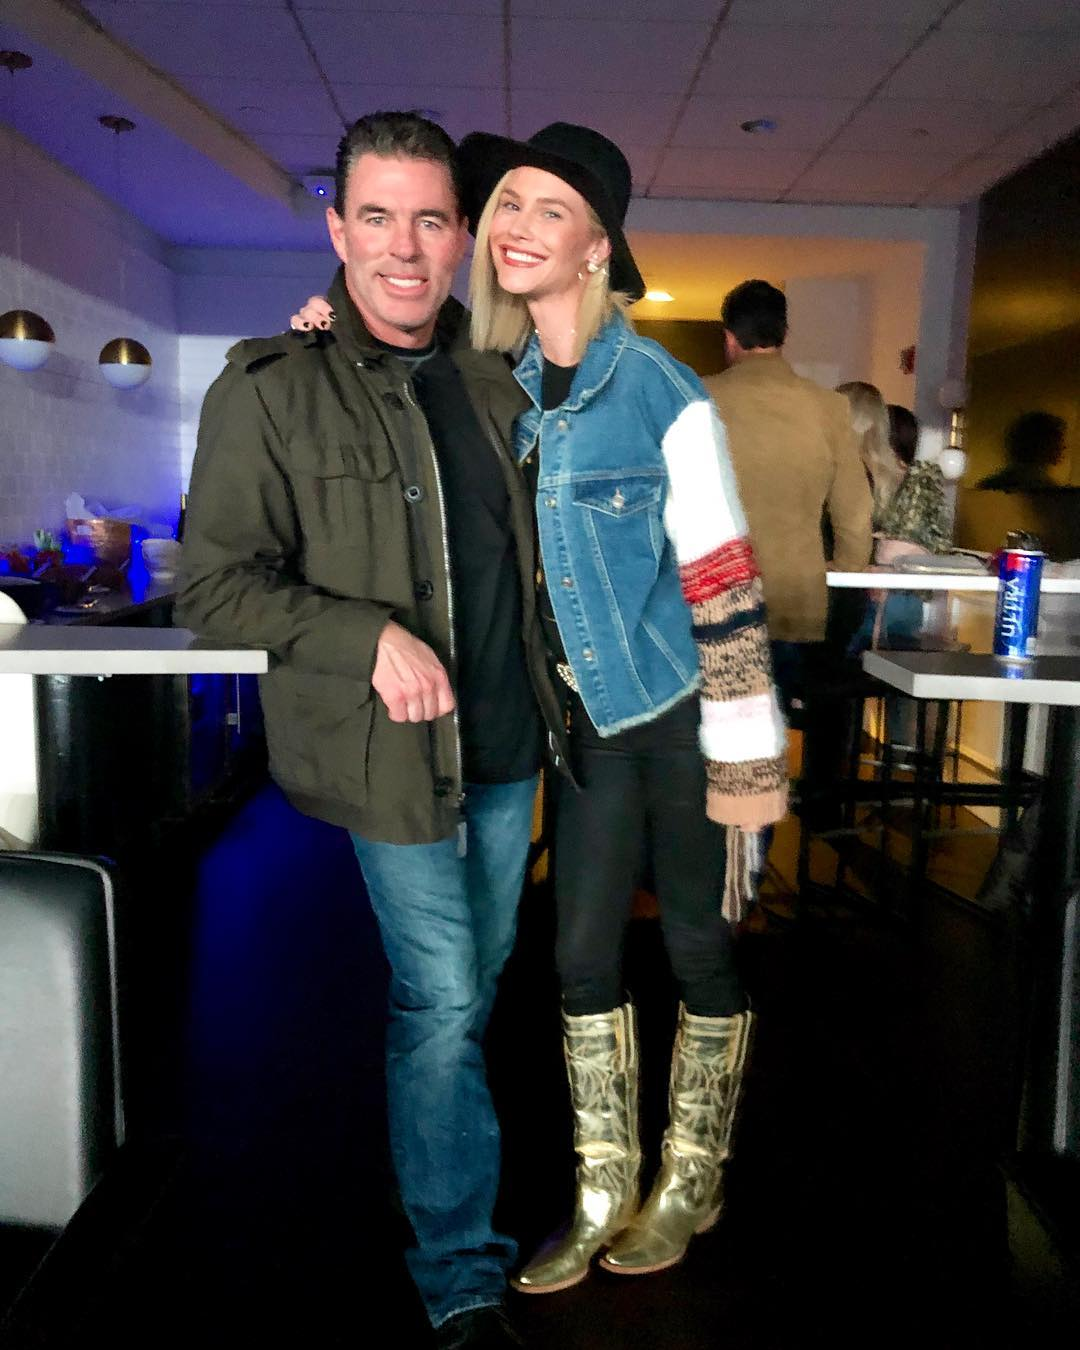 Meghan King Edmonds Breaks Her Silence After Split From Husband Jim Edmonds